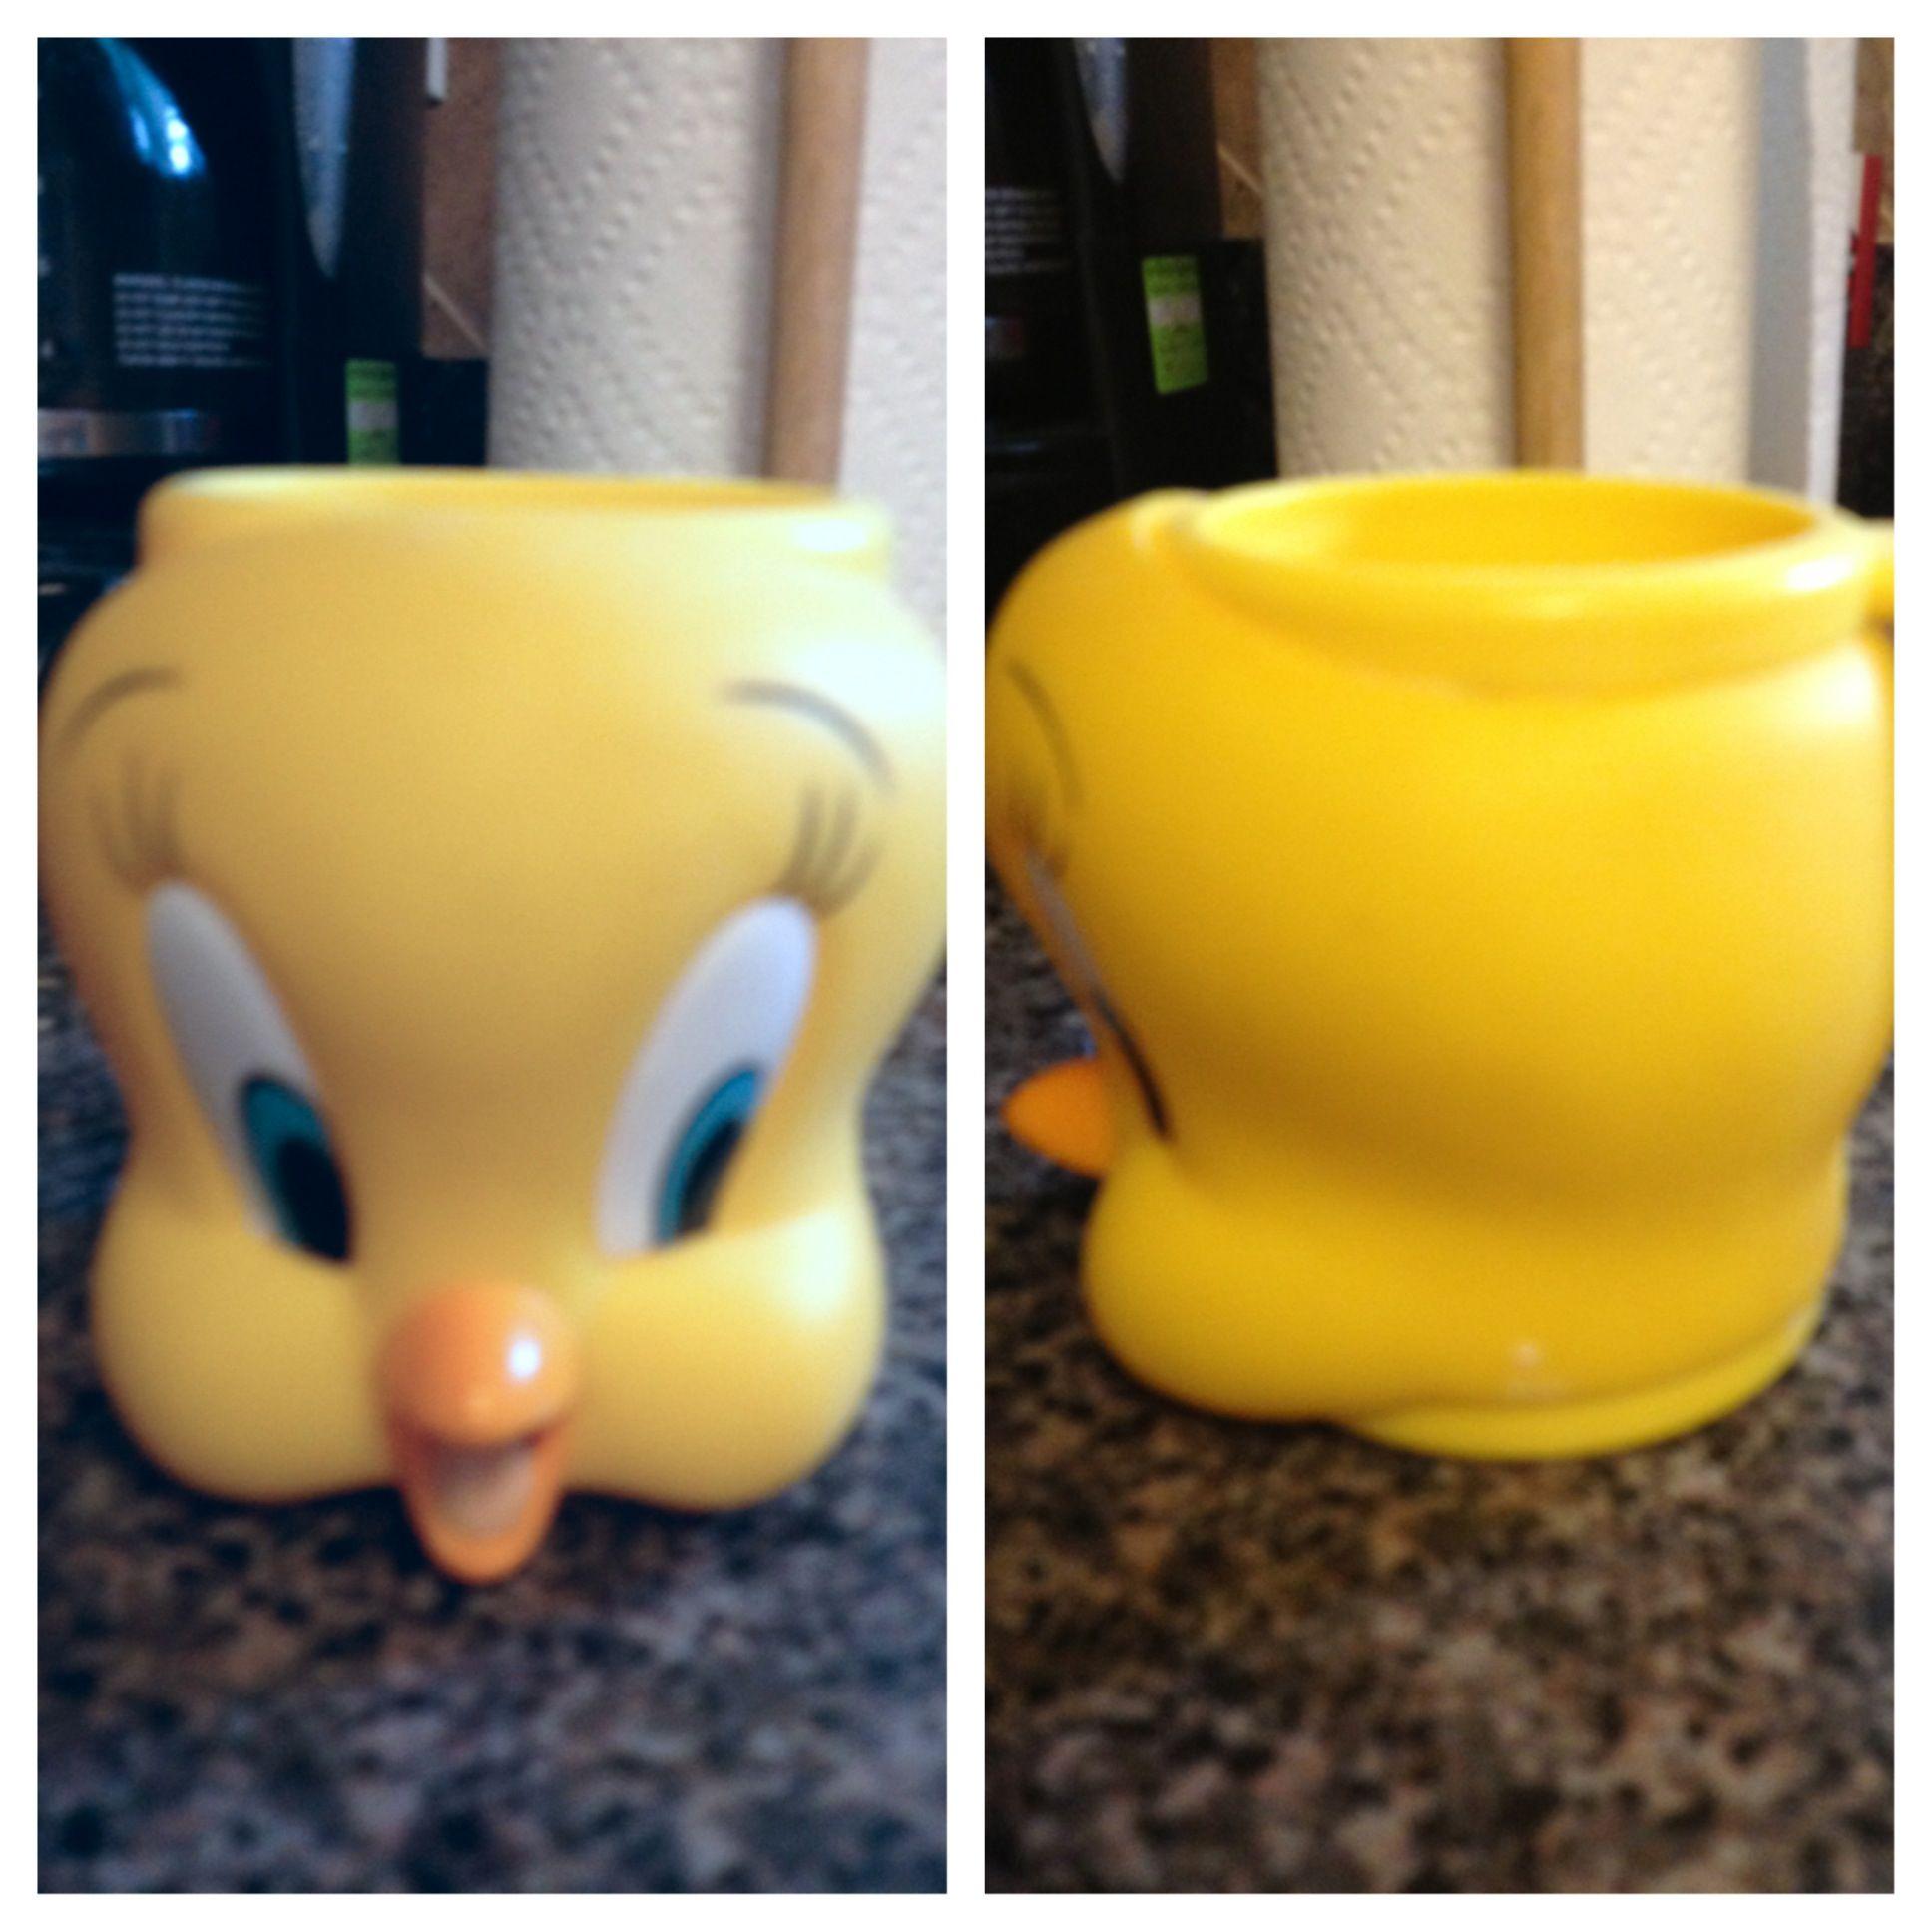 Tweety bird mug! From when I was a little girl